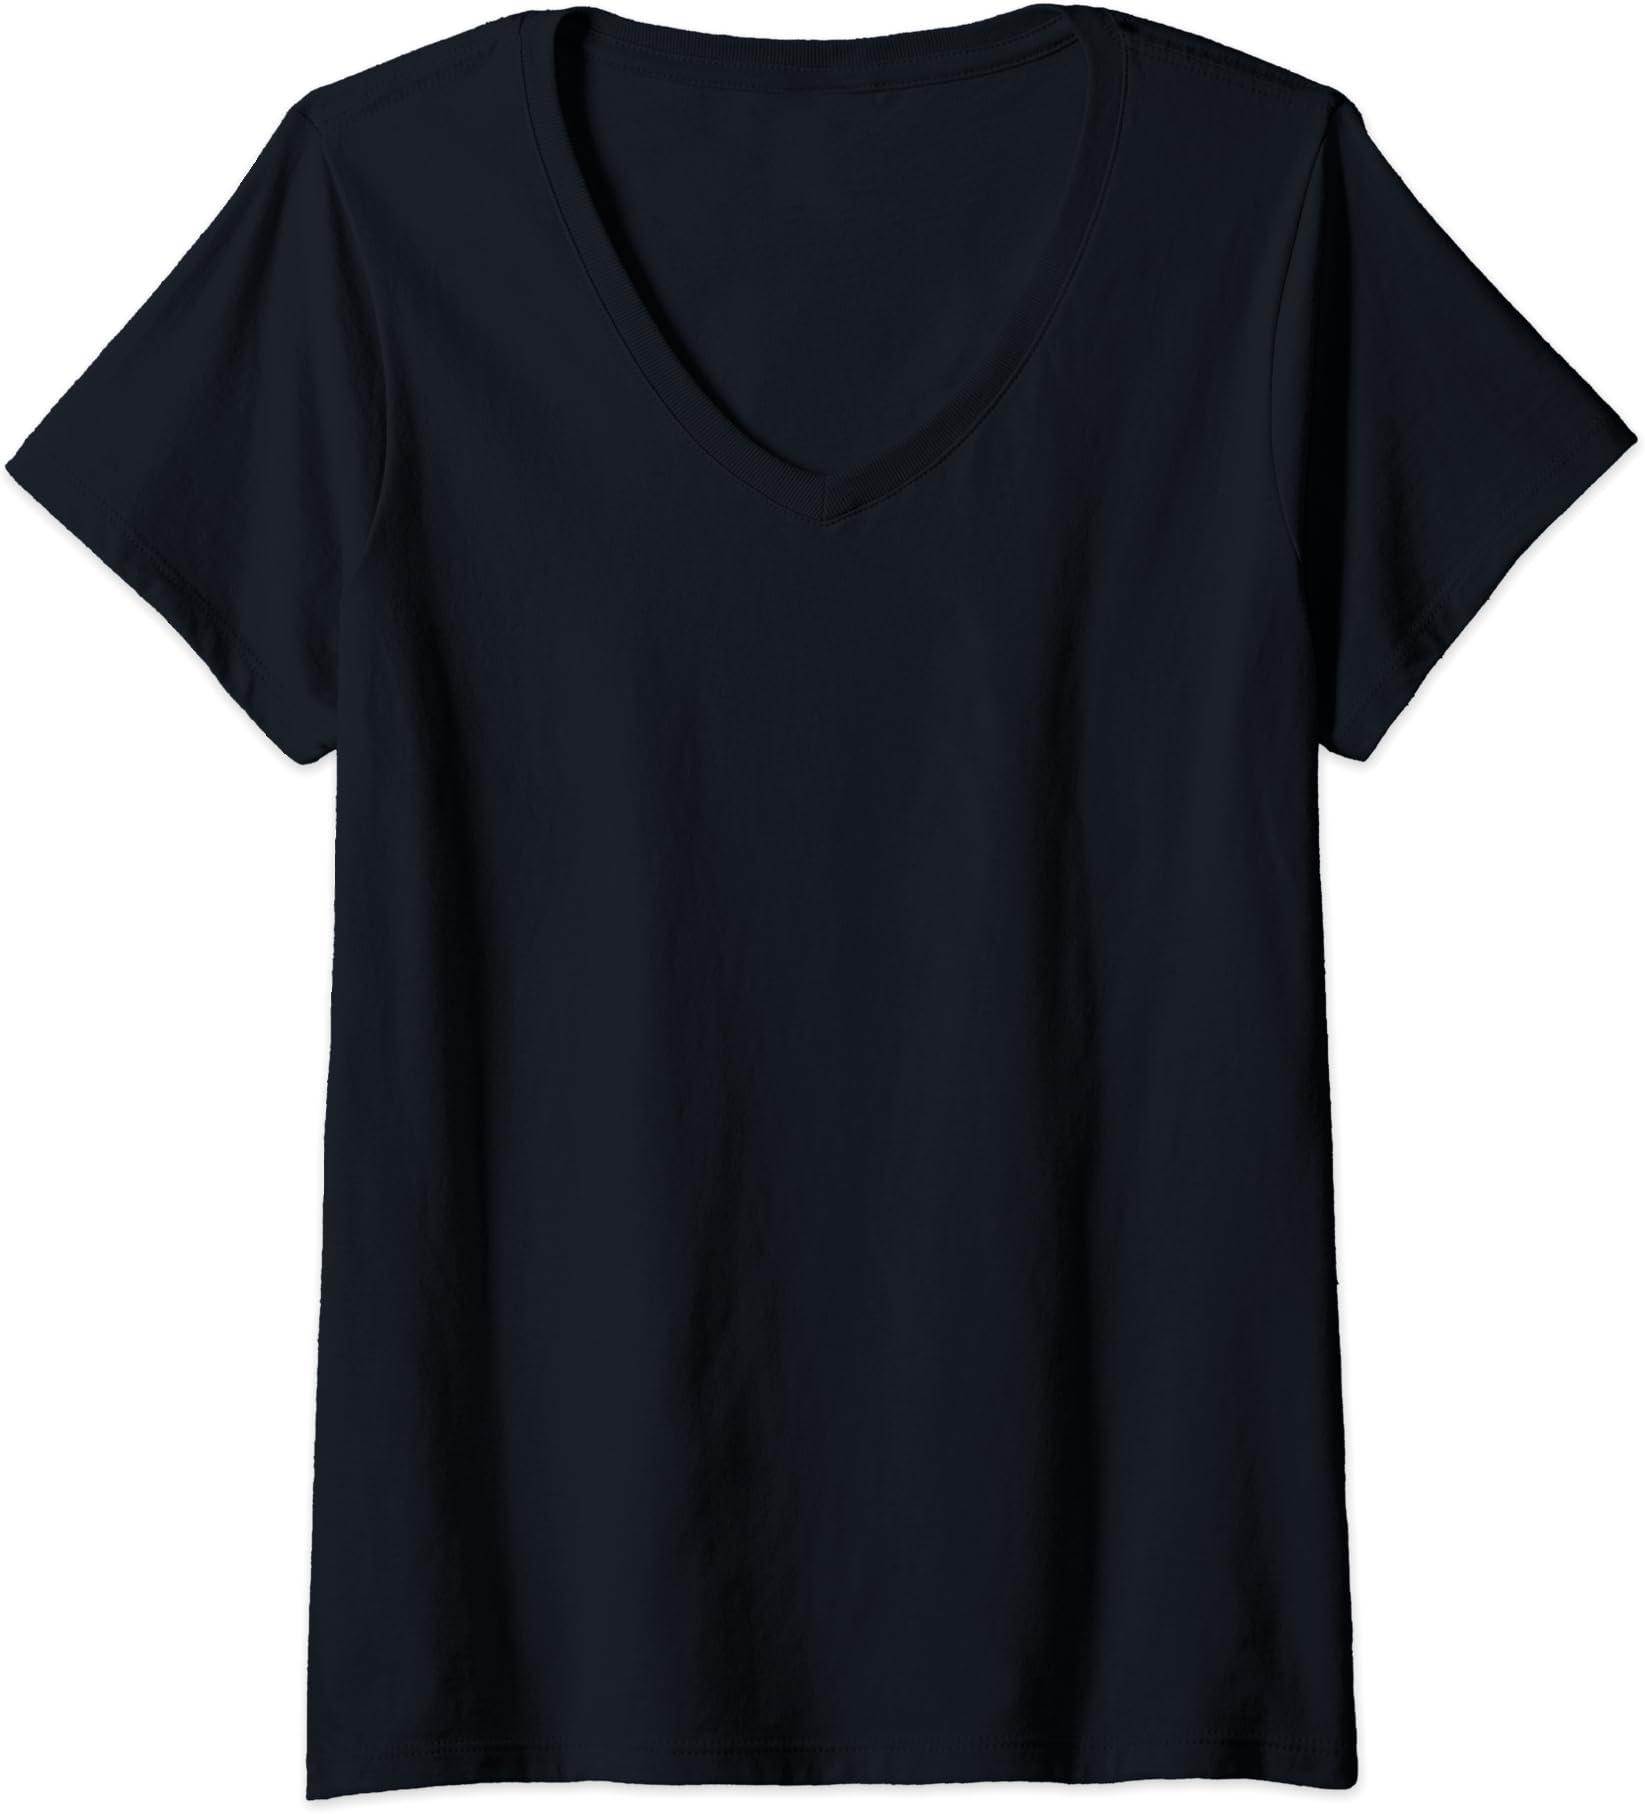 Women/'s Pajama Sleepshirt 100/% Cotton Short Sleeve Long PJ Top Born to Flirt